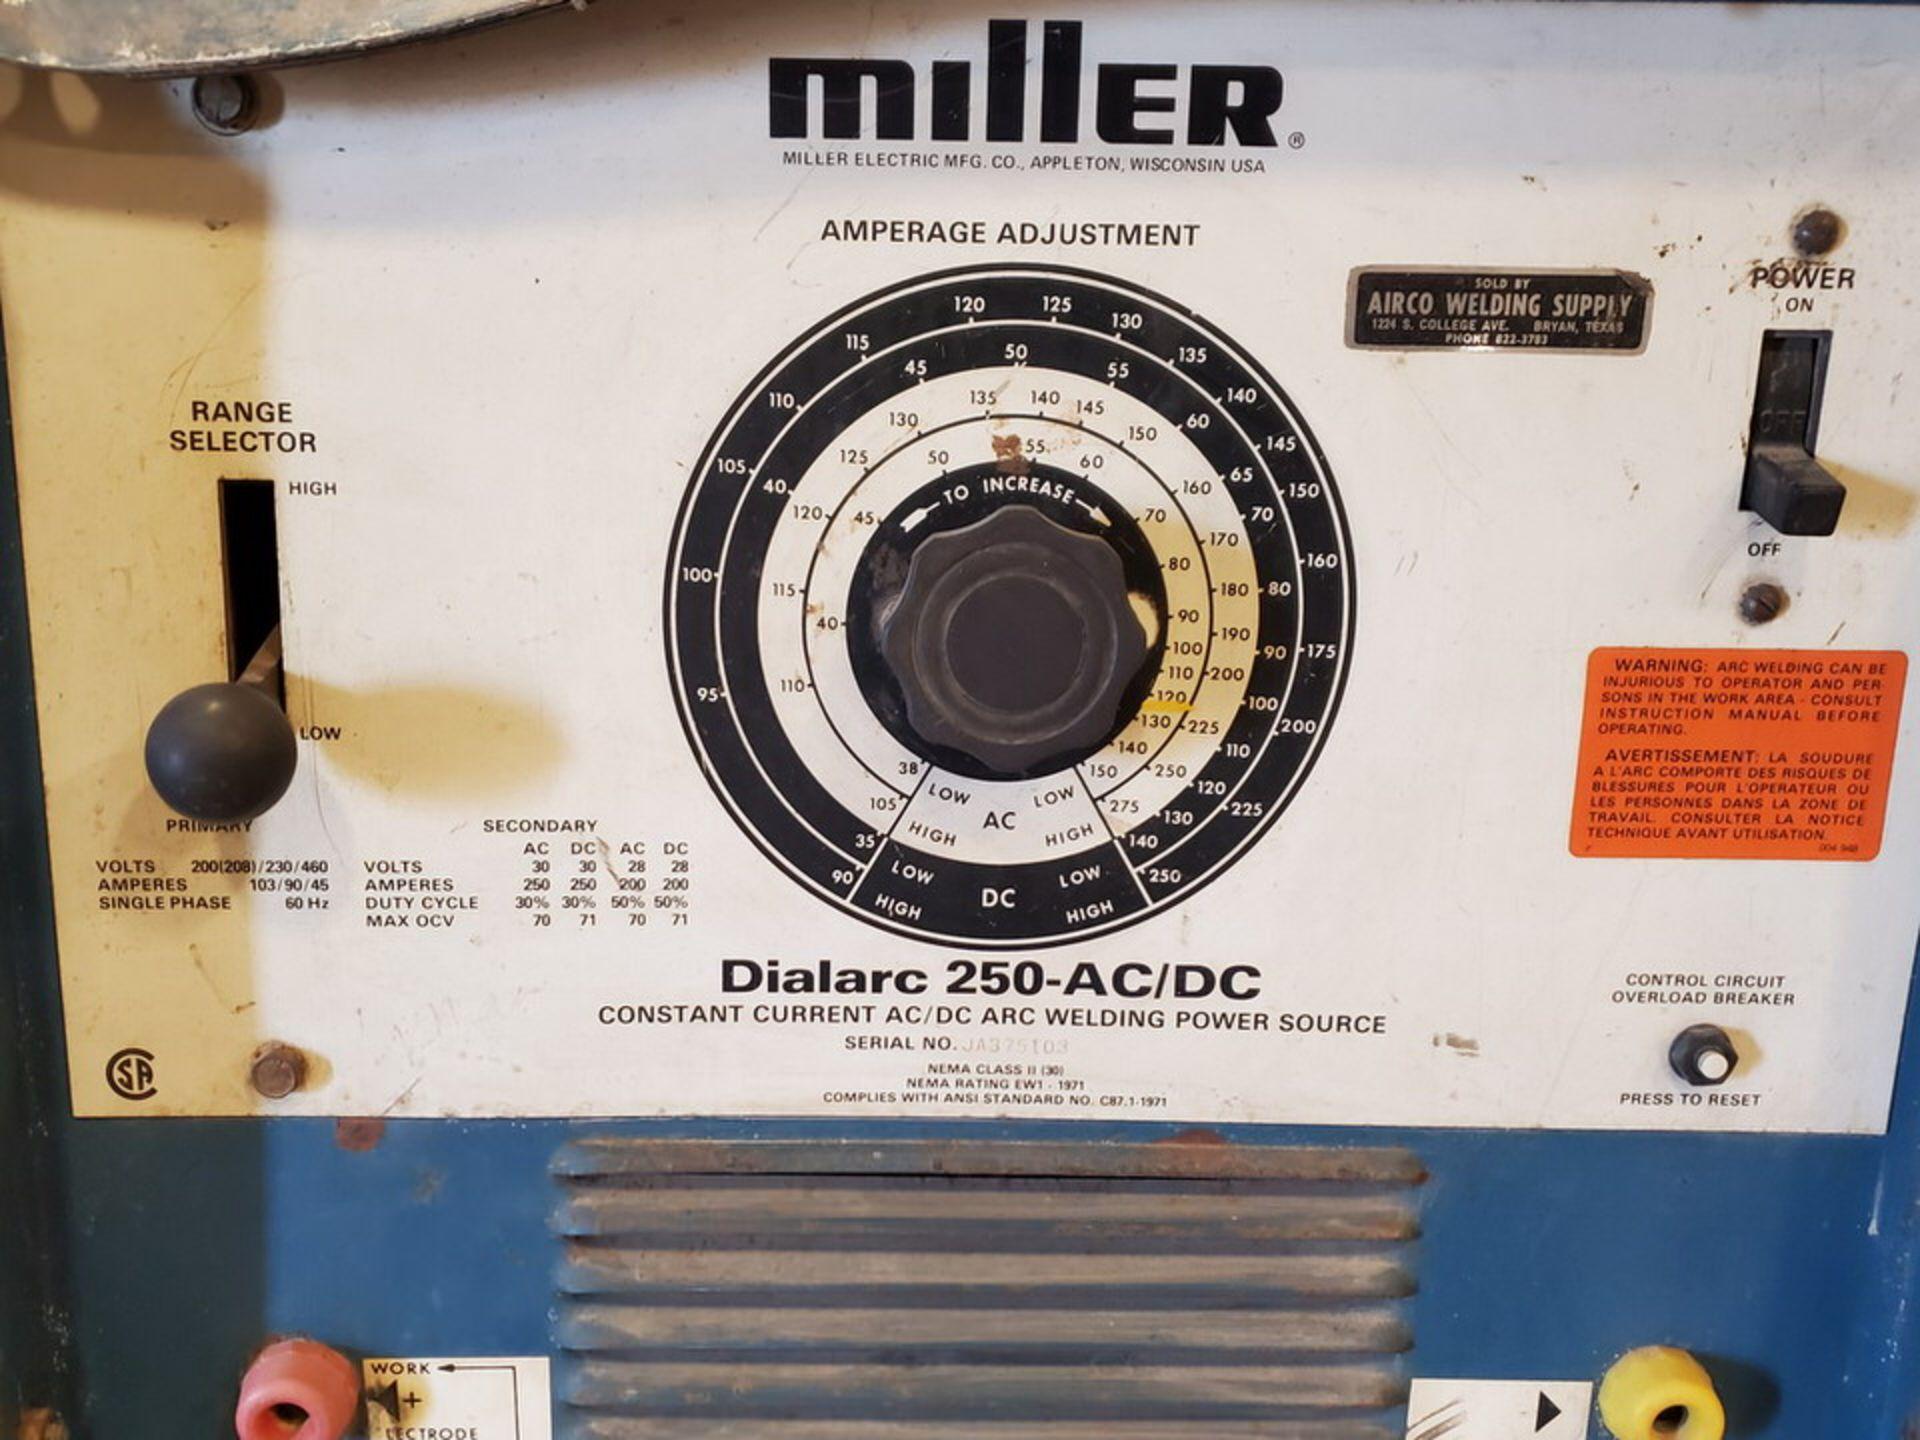 Miller Dialarc 250 Stick Welder 200(208)/230/460V, 60HZ, 1PH - Image 7 of 7